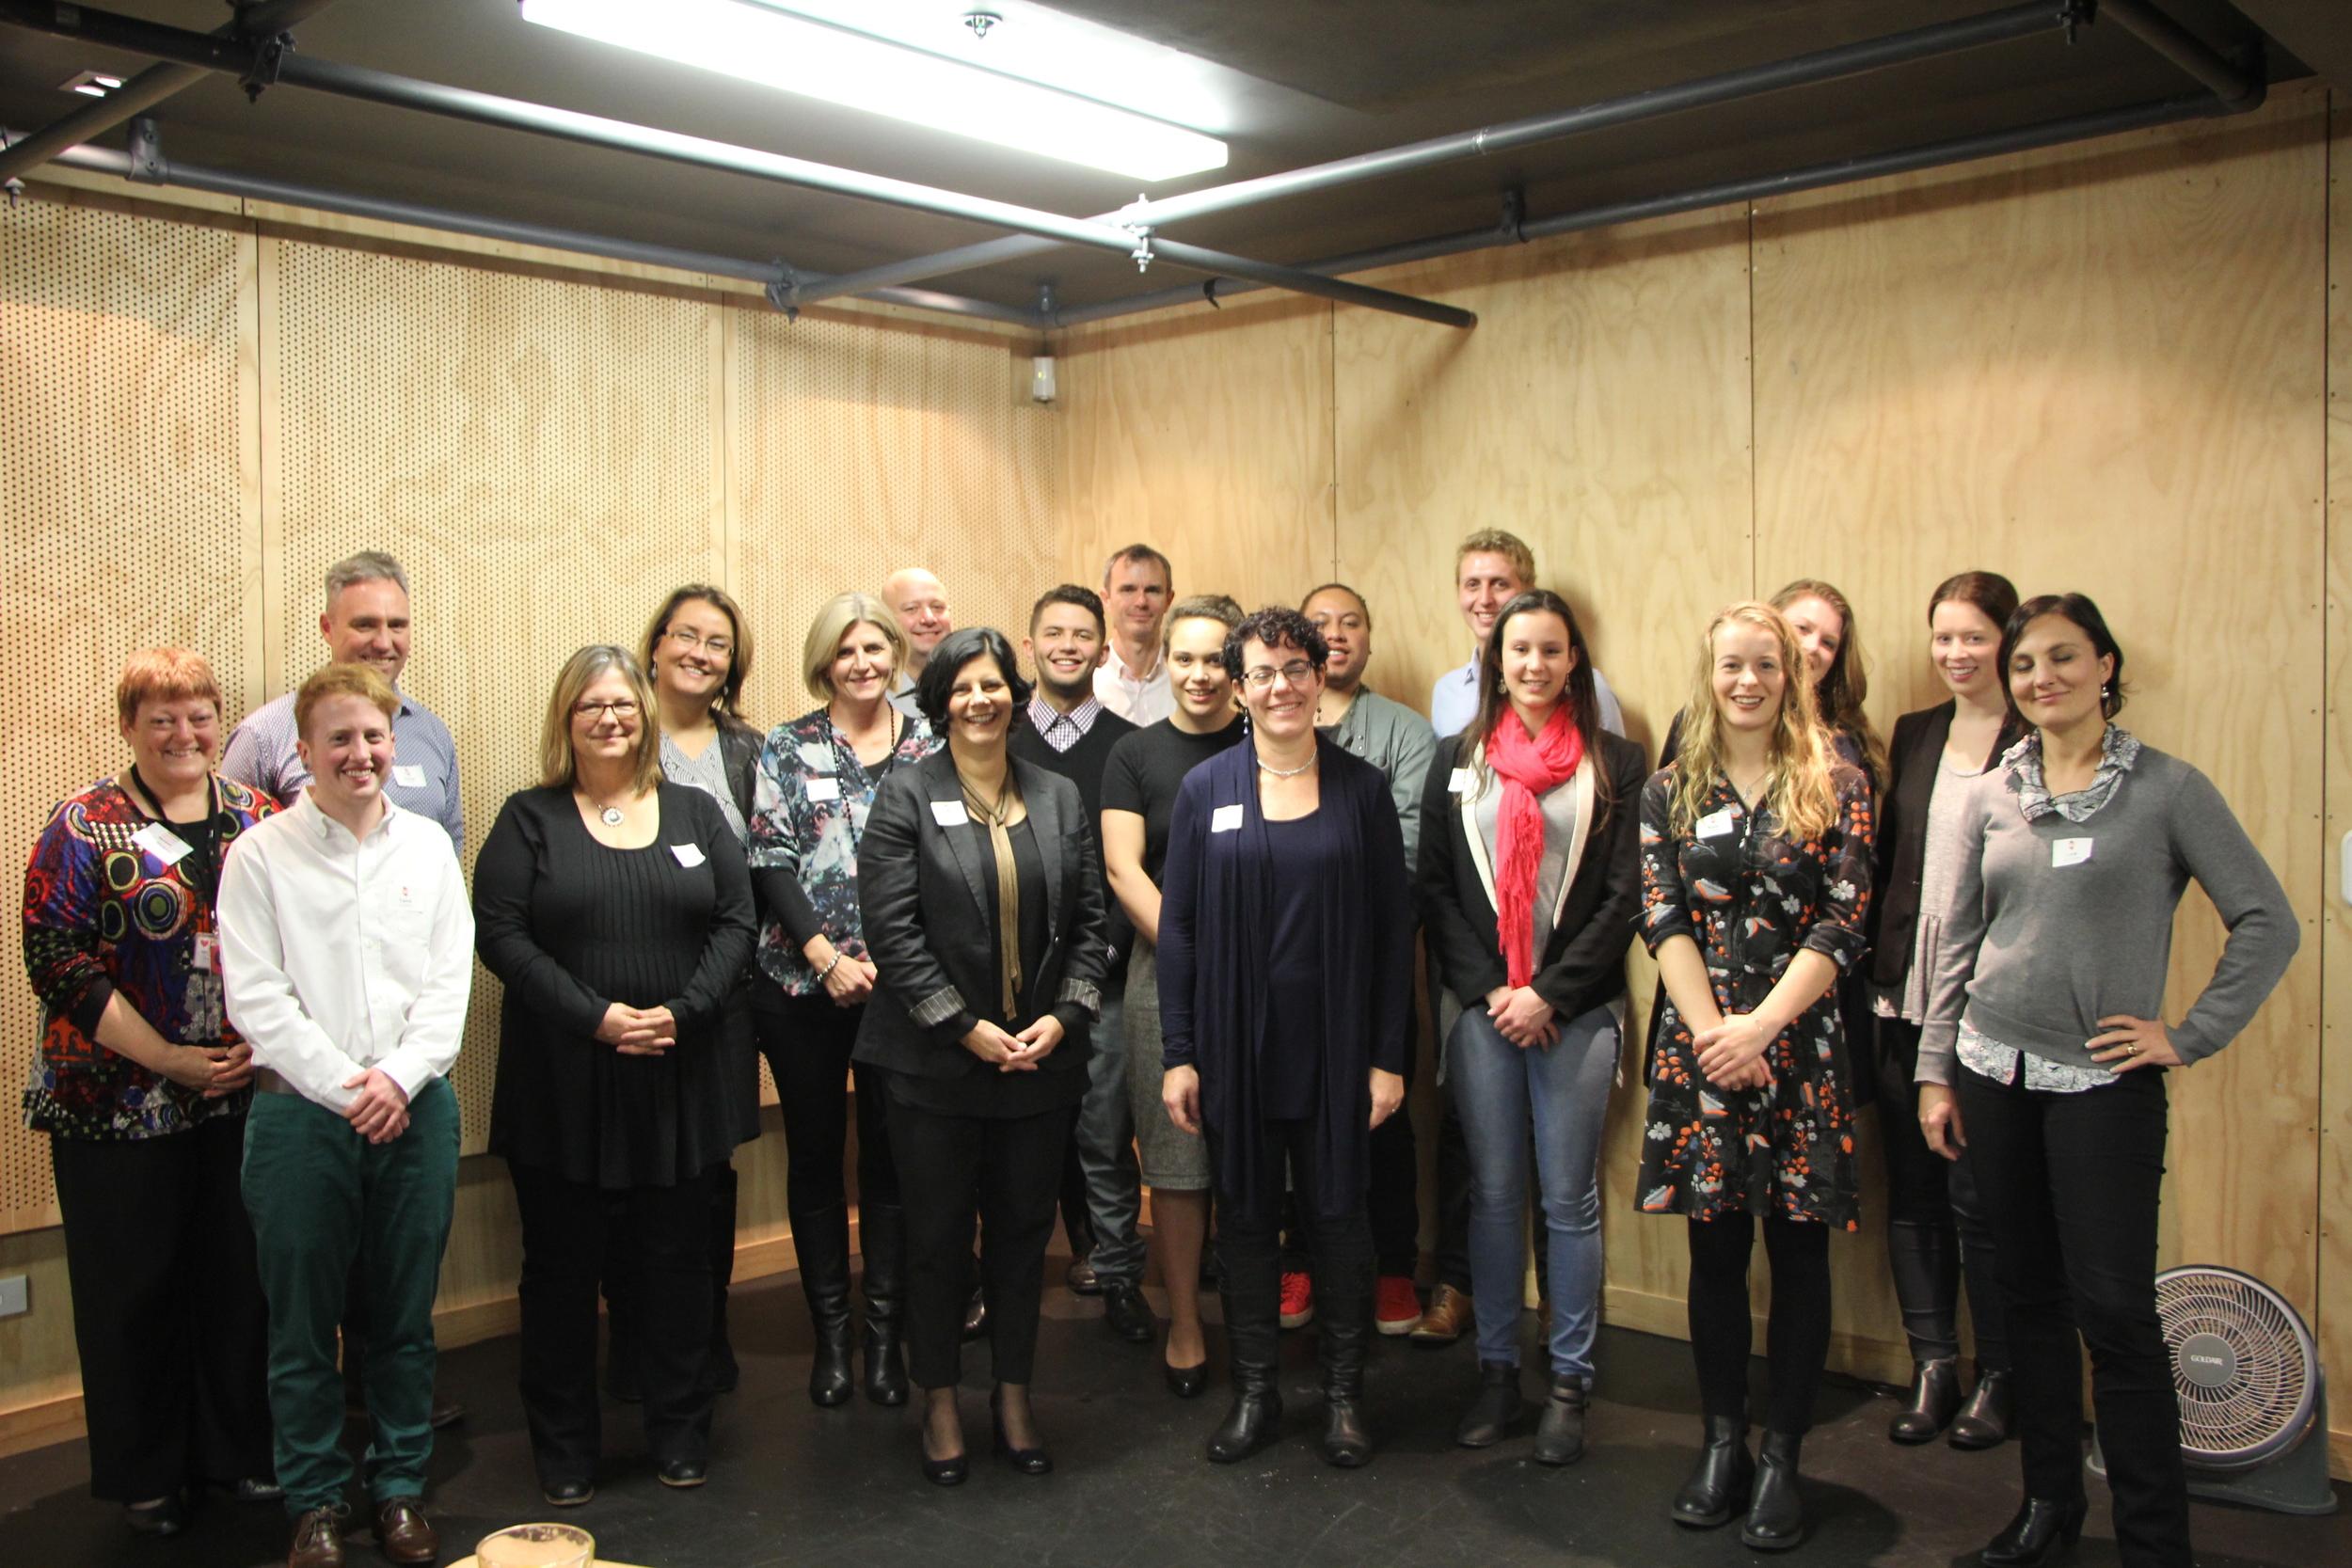 Mentees & Mentors from Auckland, Hamilton & Christchurch